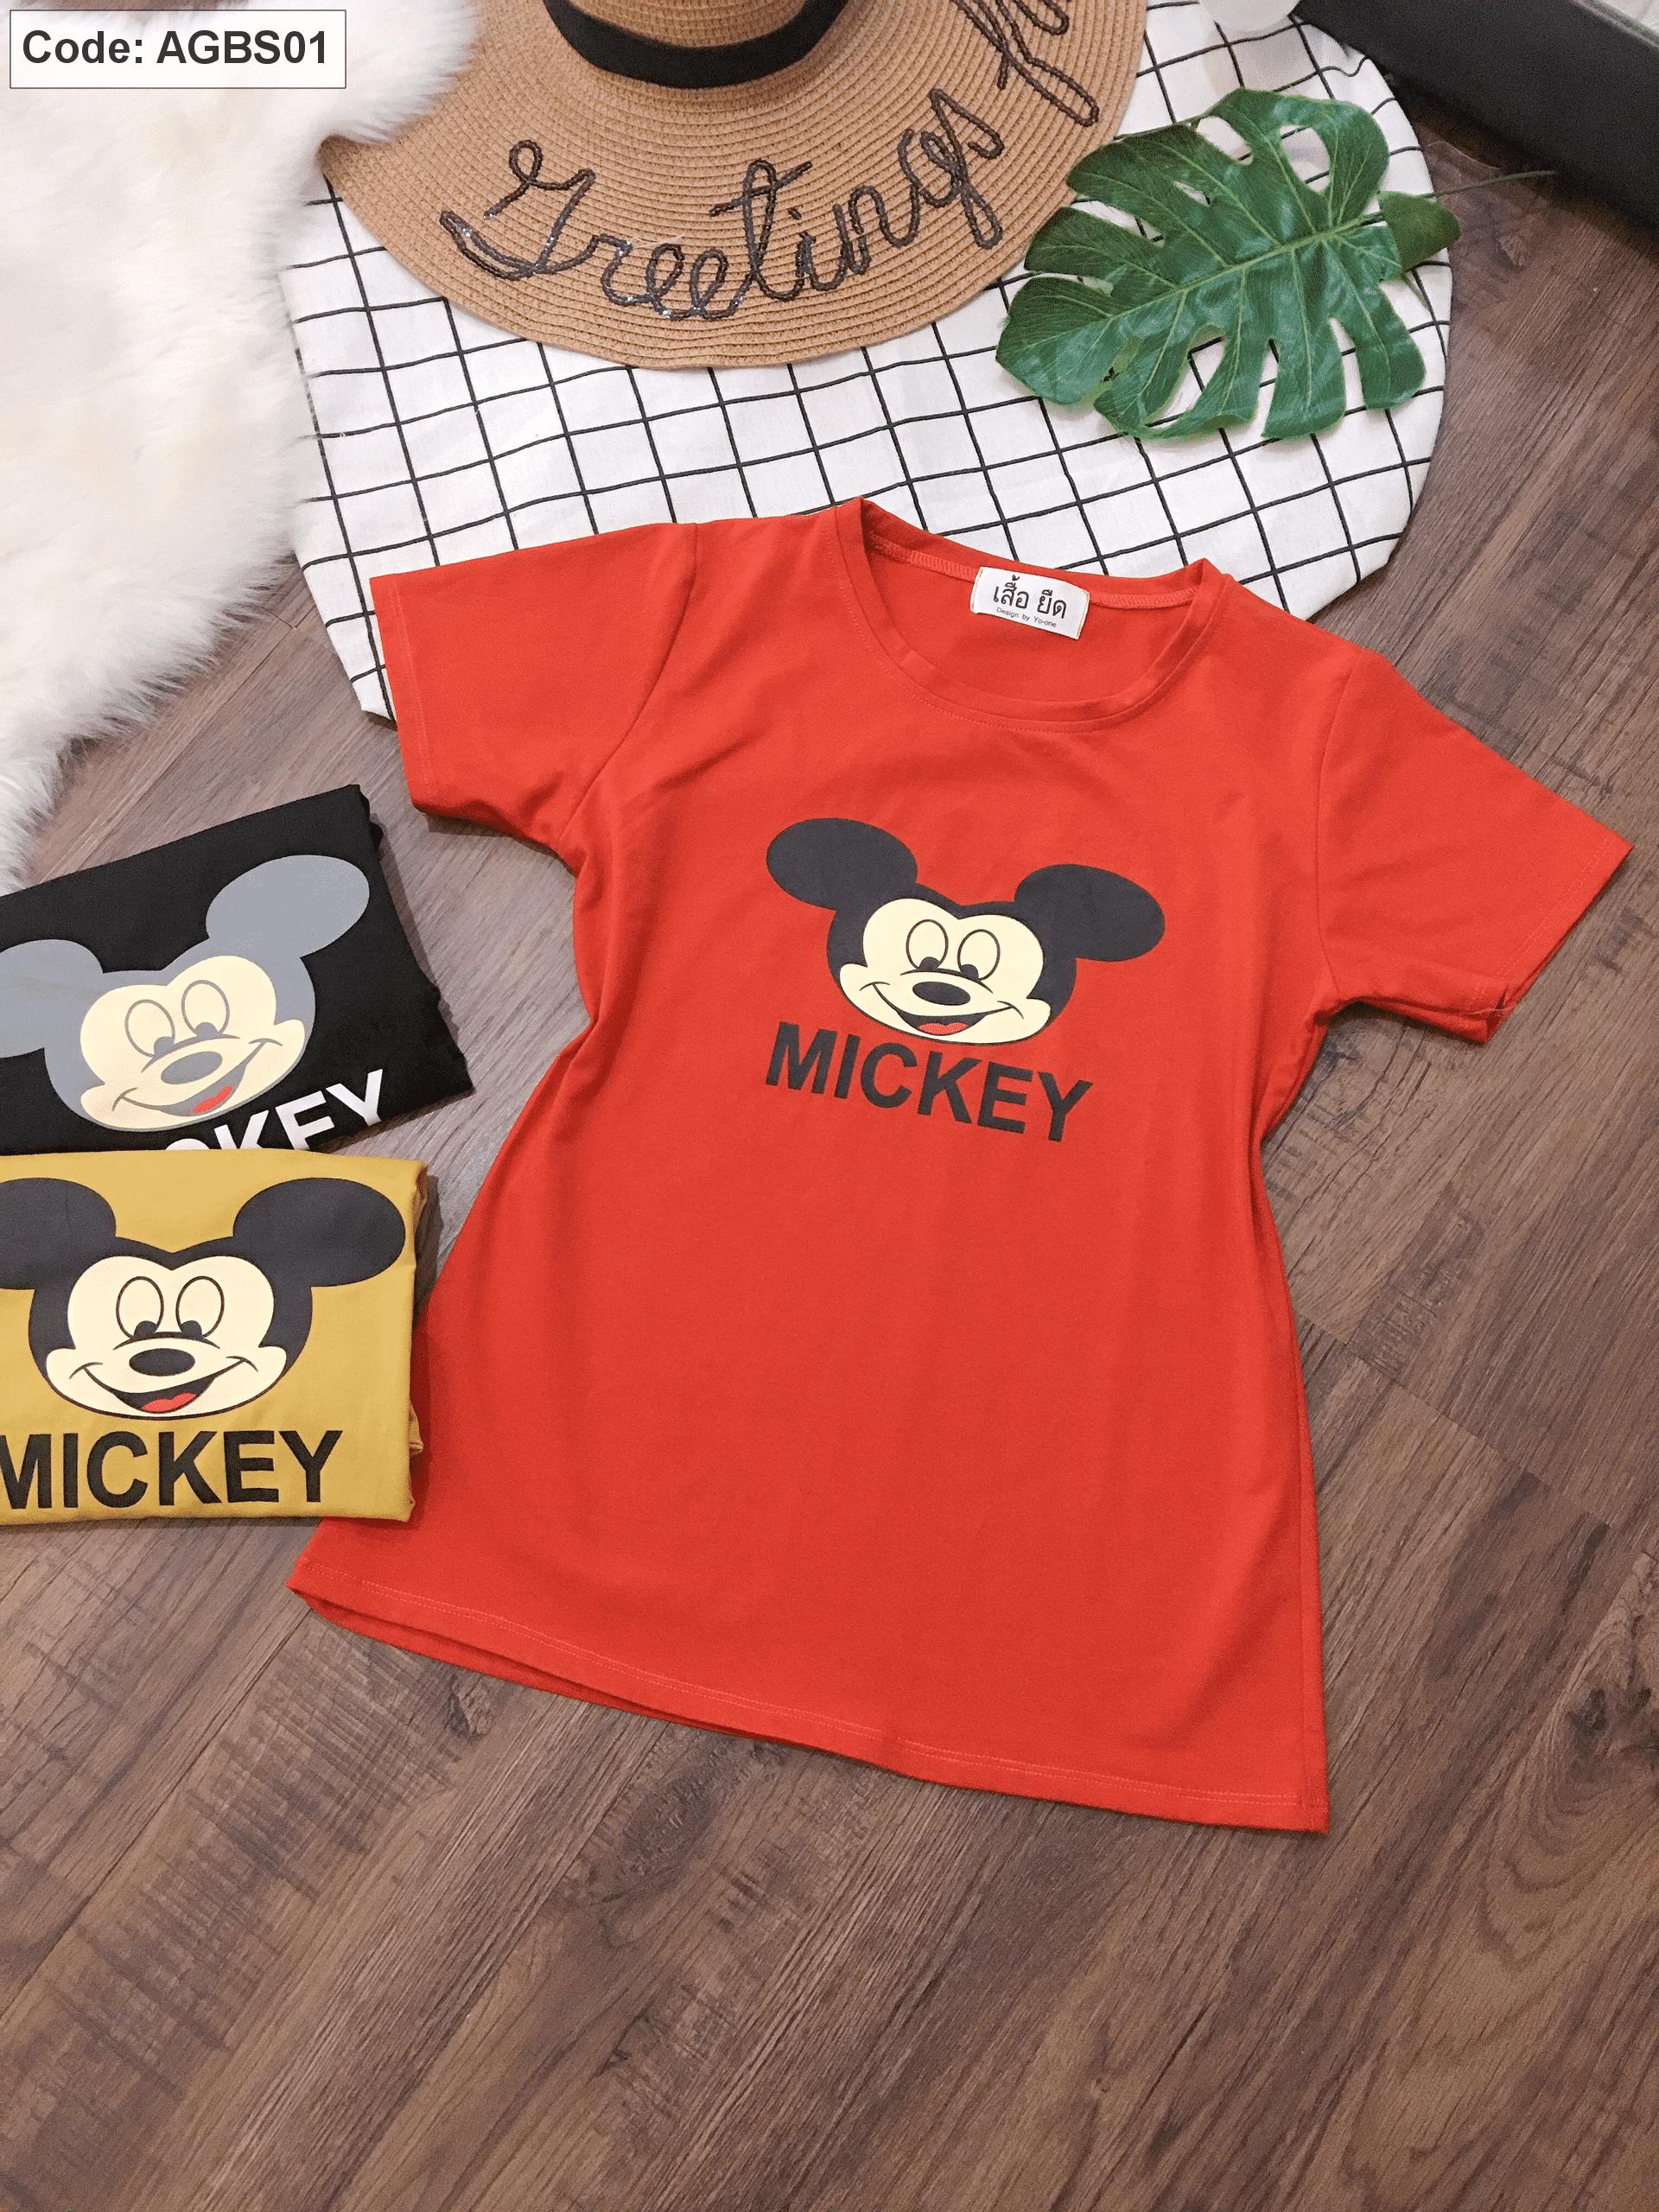 Áo thun nữ in hình Mickey Big size 60kg